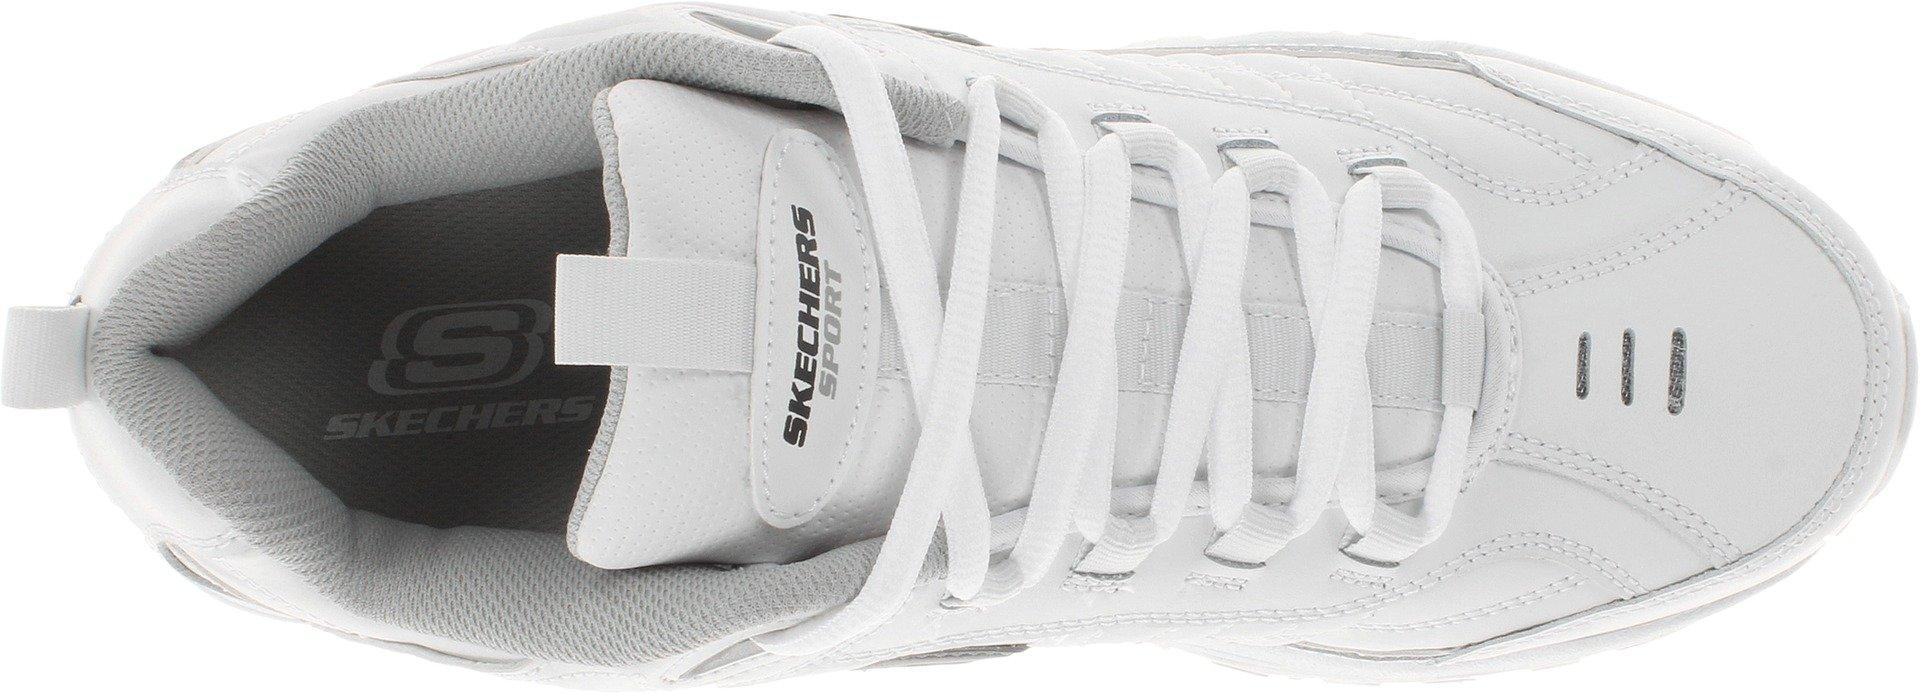 Skechers Men's Energy Afterburn Lace-Up Sneaker,White,8 M US by Skechers (Image #7)